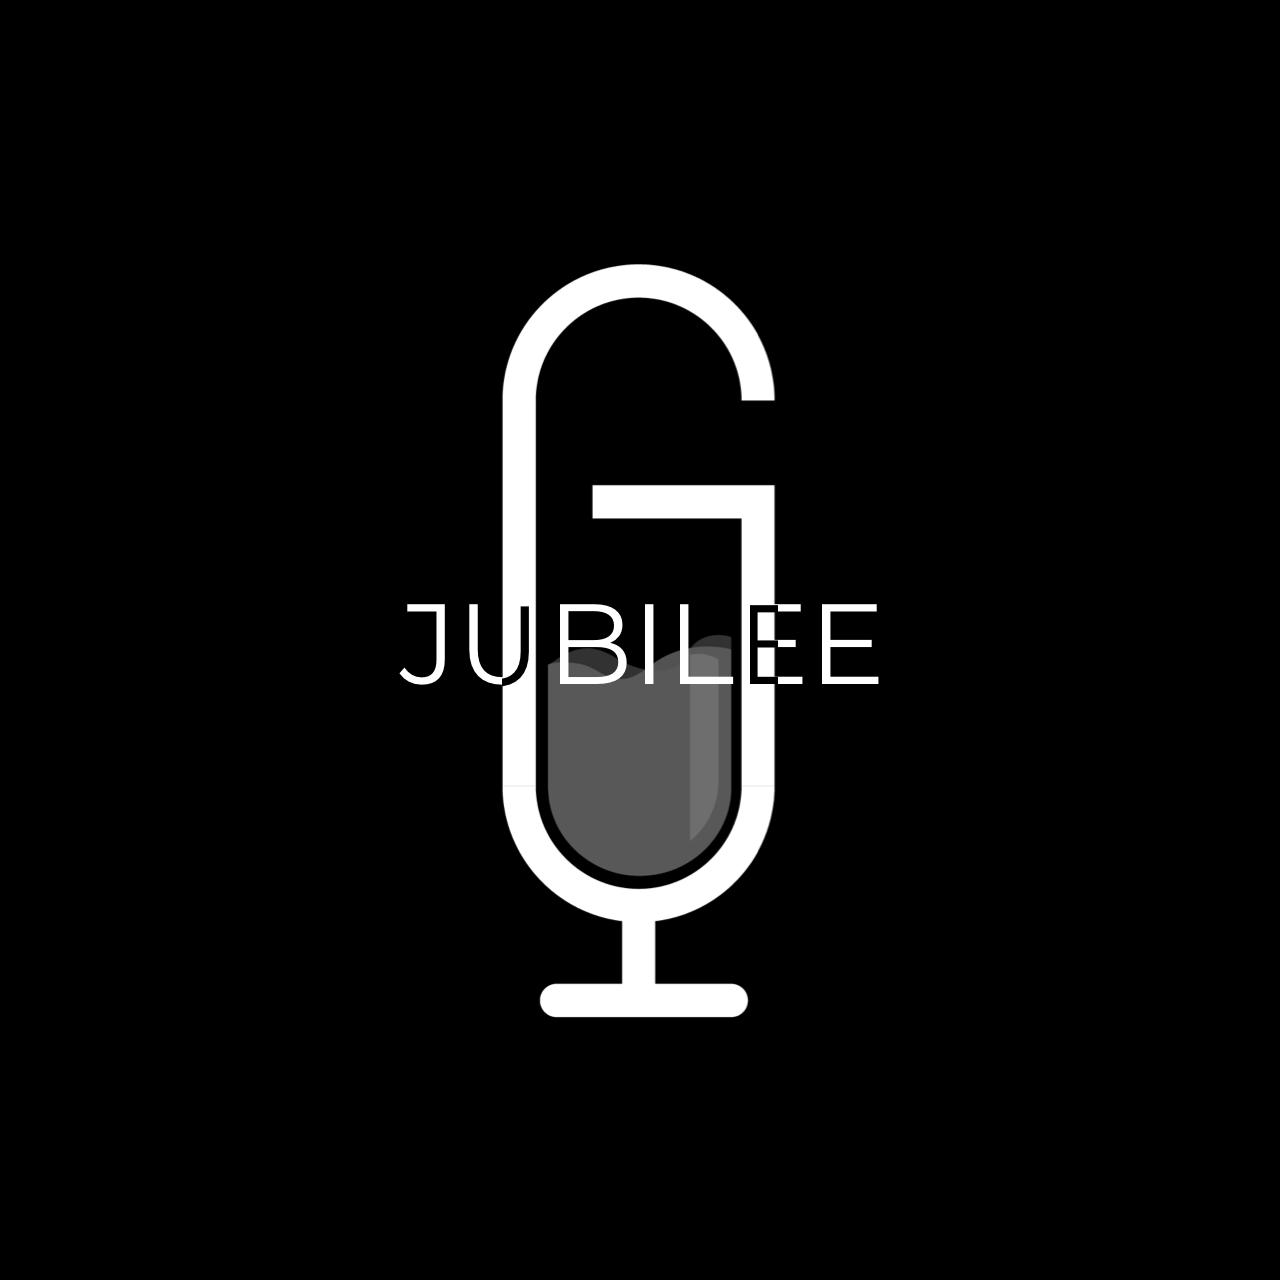 Jubilee Package